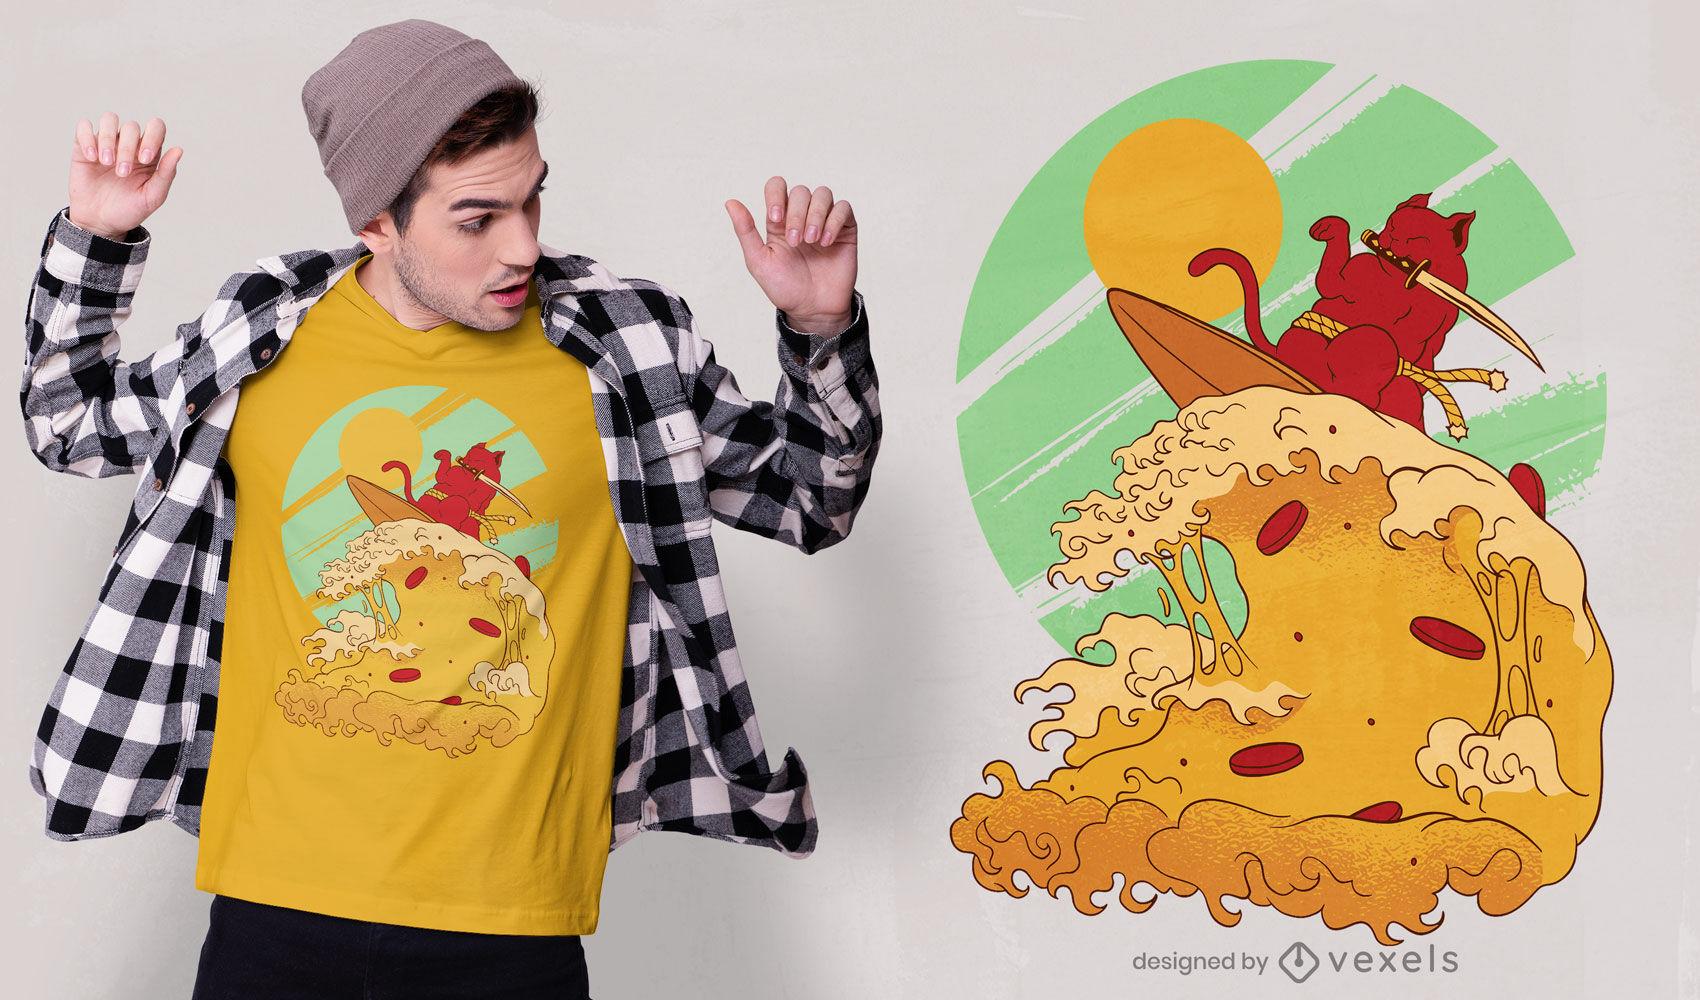 Diseño de camiseta de ola de pizza de gato japonés surfing